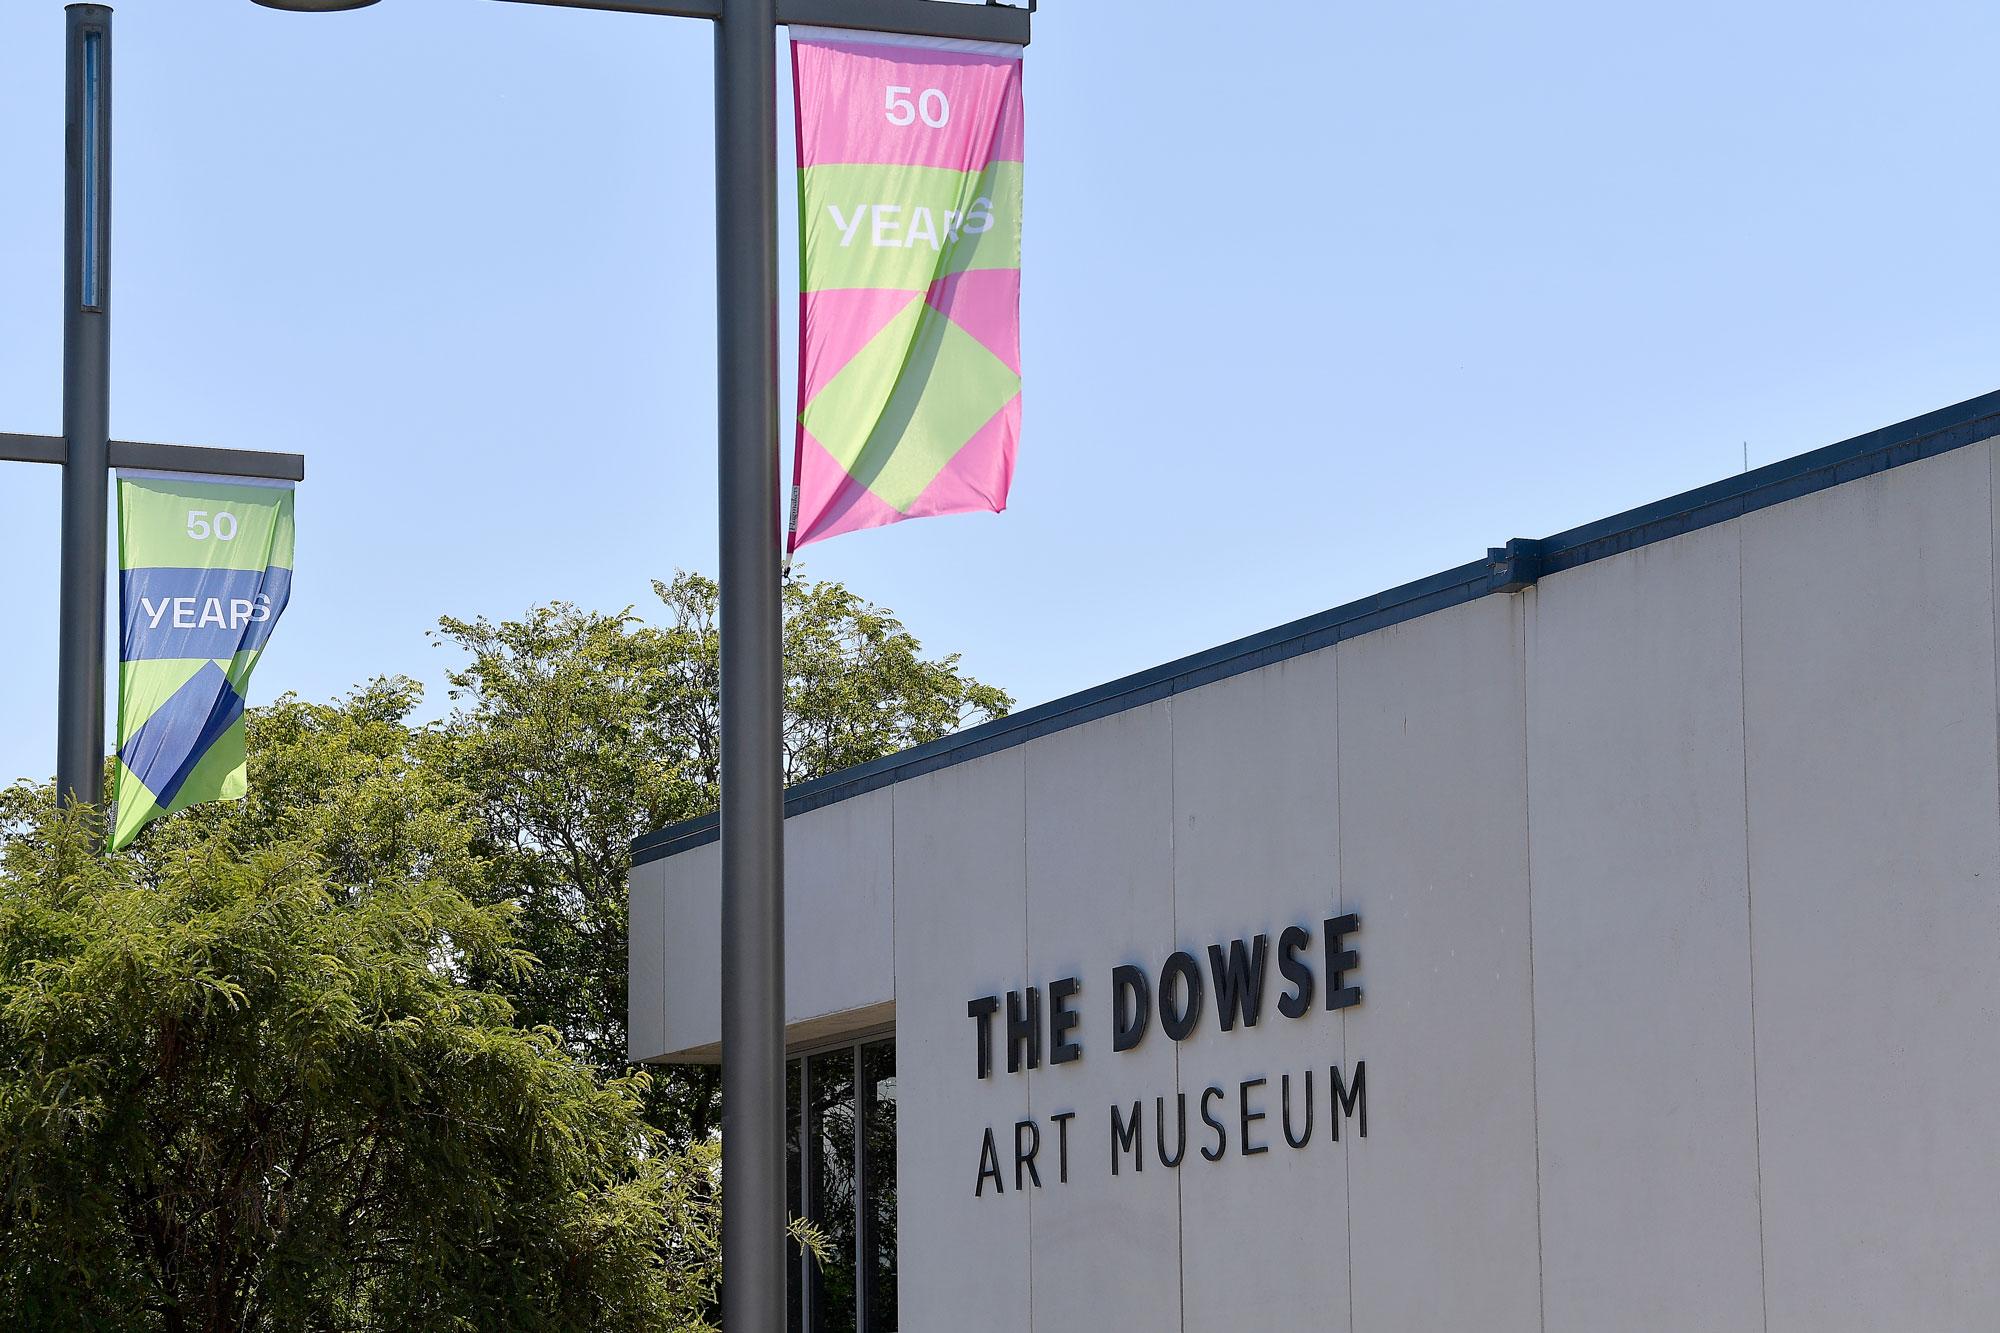 The Dowse Art Museum